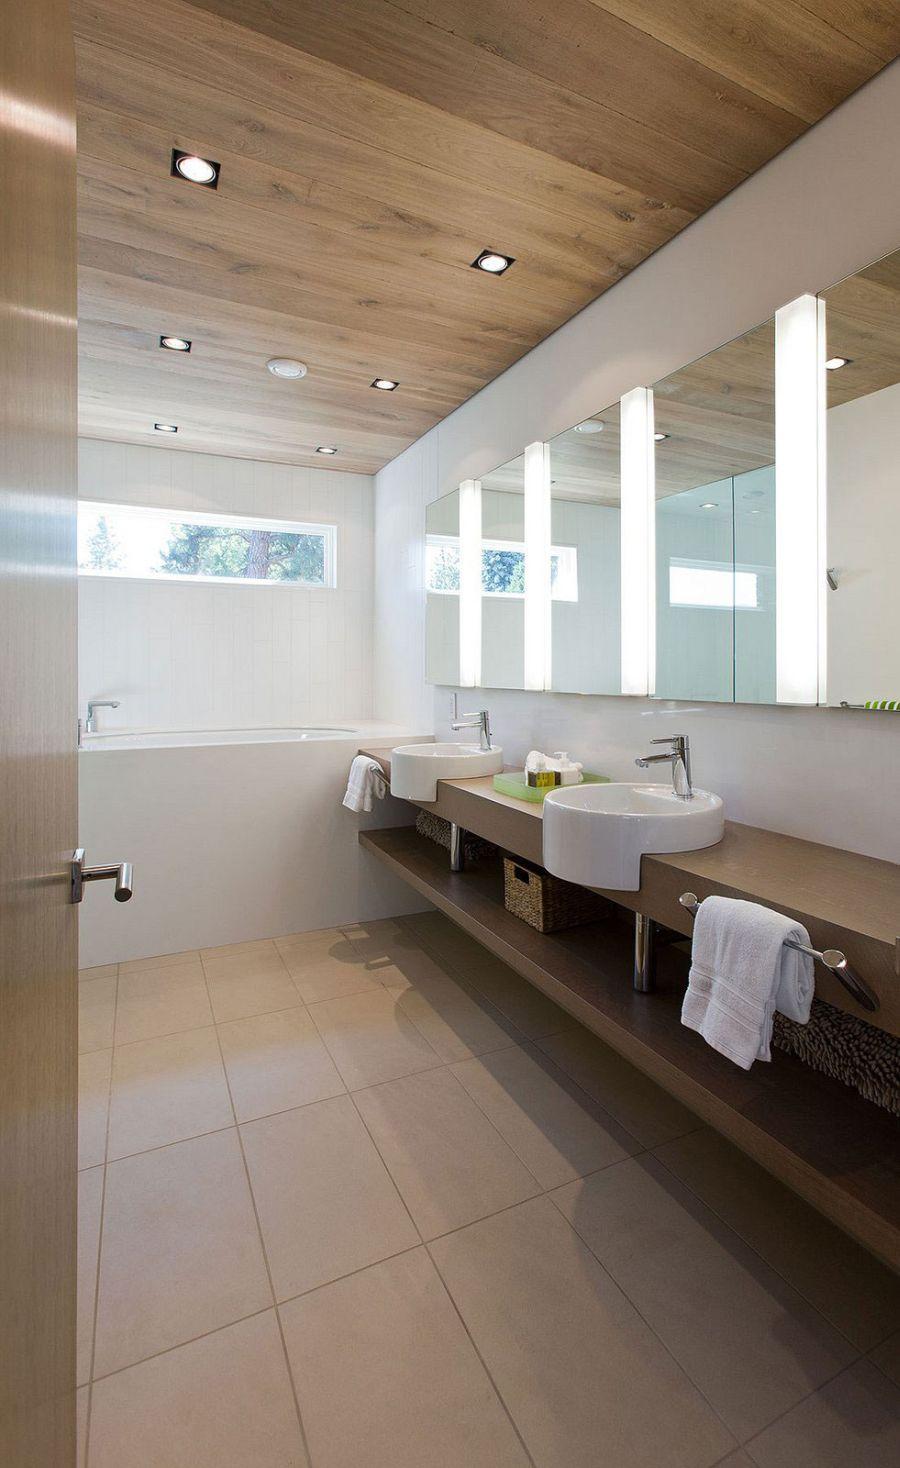 Floating vanity in the bathroom with storage